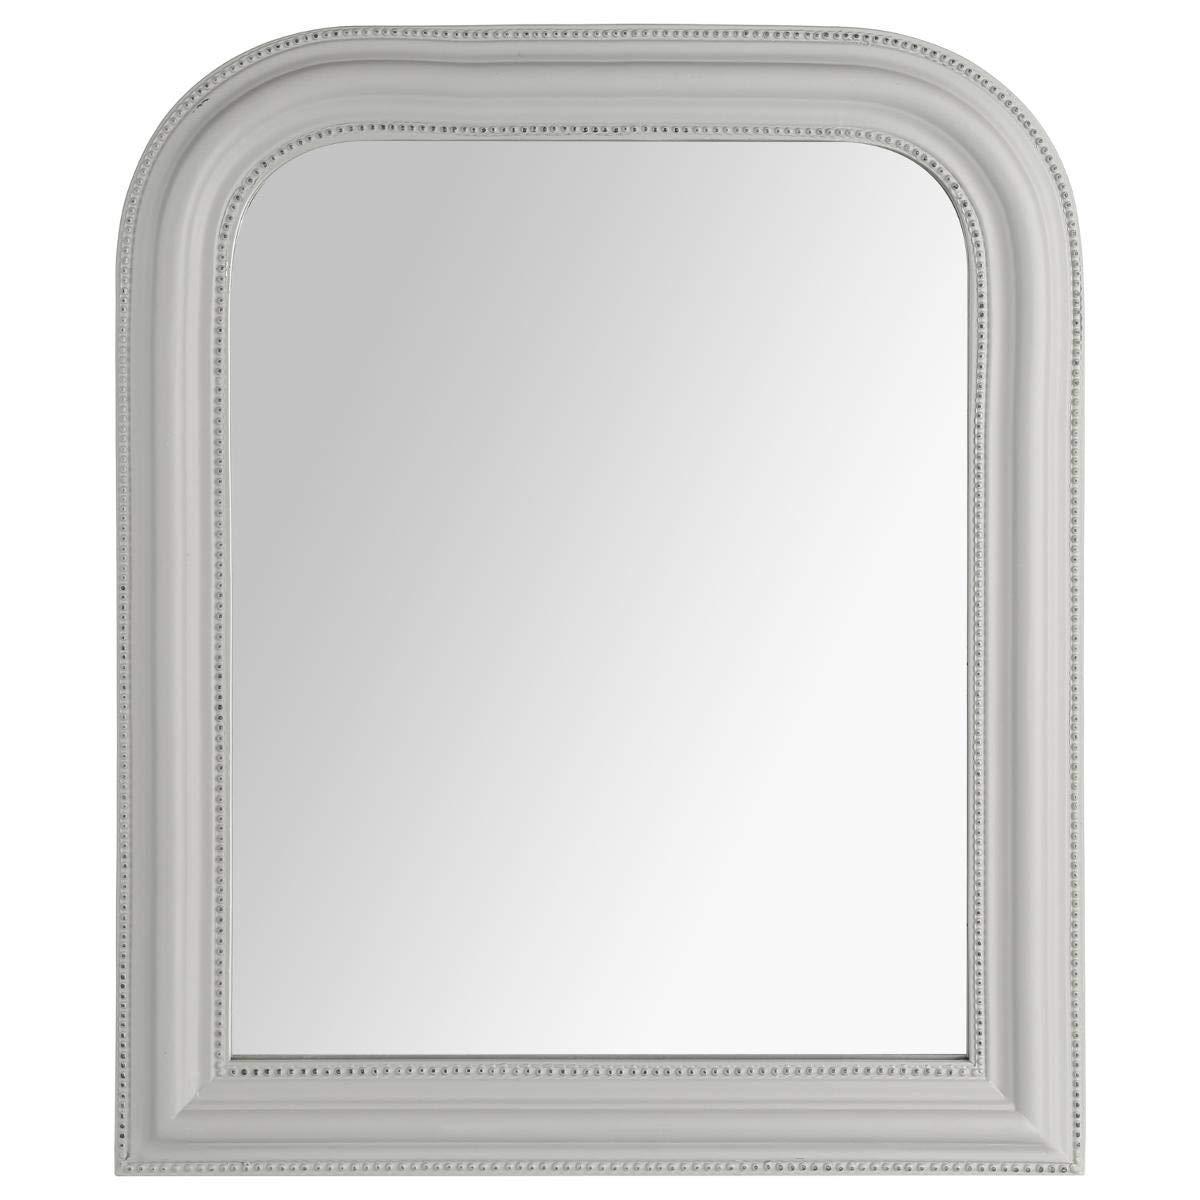 Atmosphera Miroir Cadre en Bois Gris Adele 50X60 cm